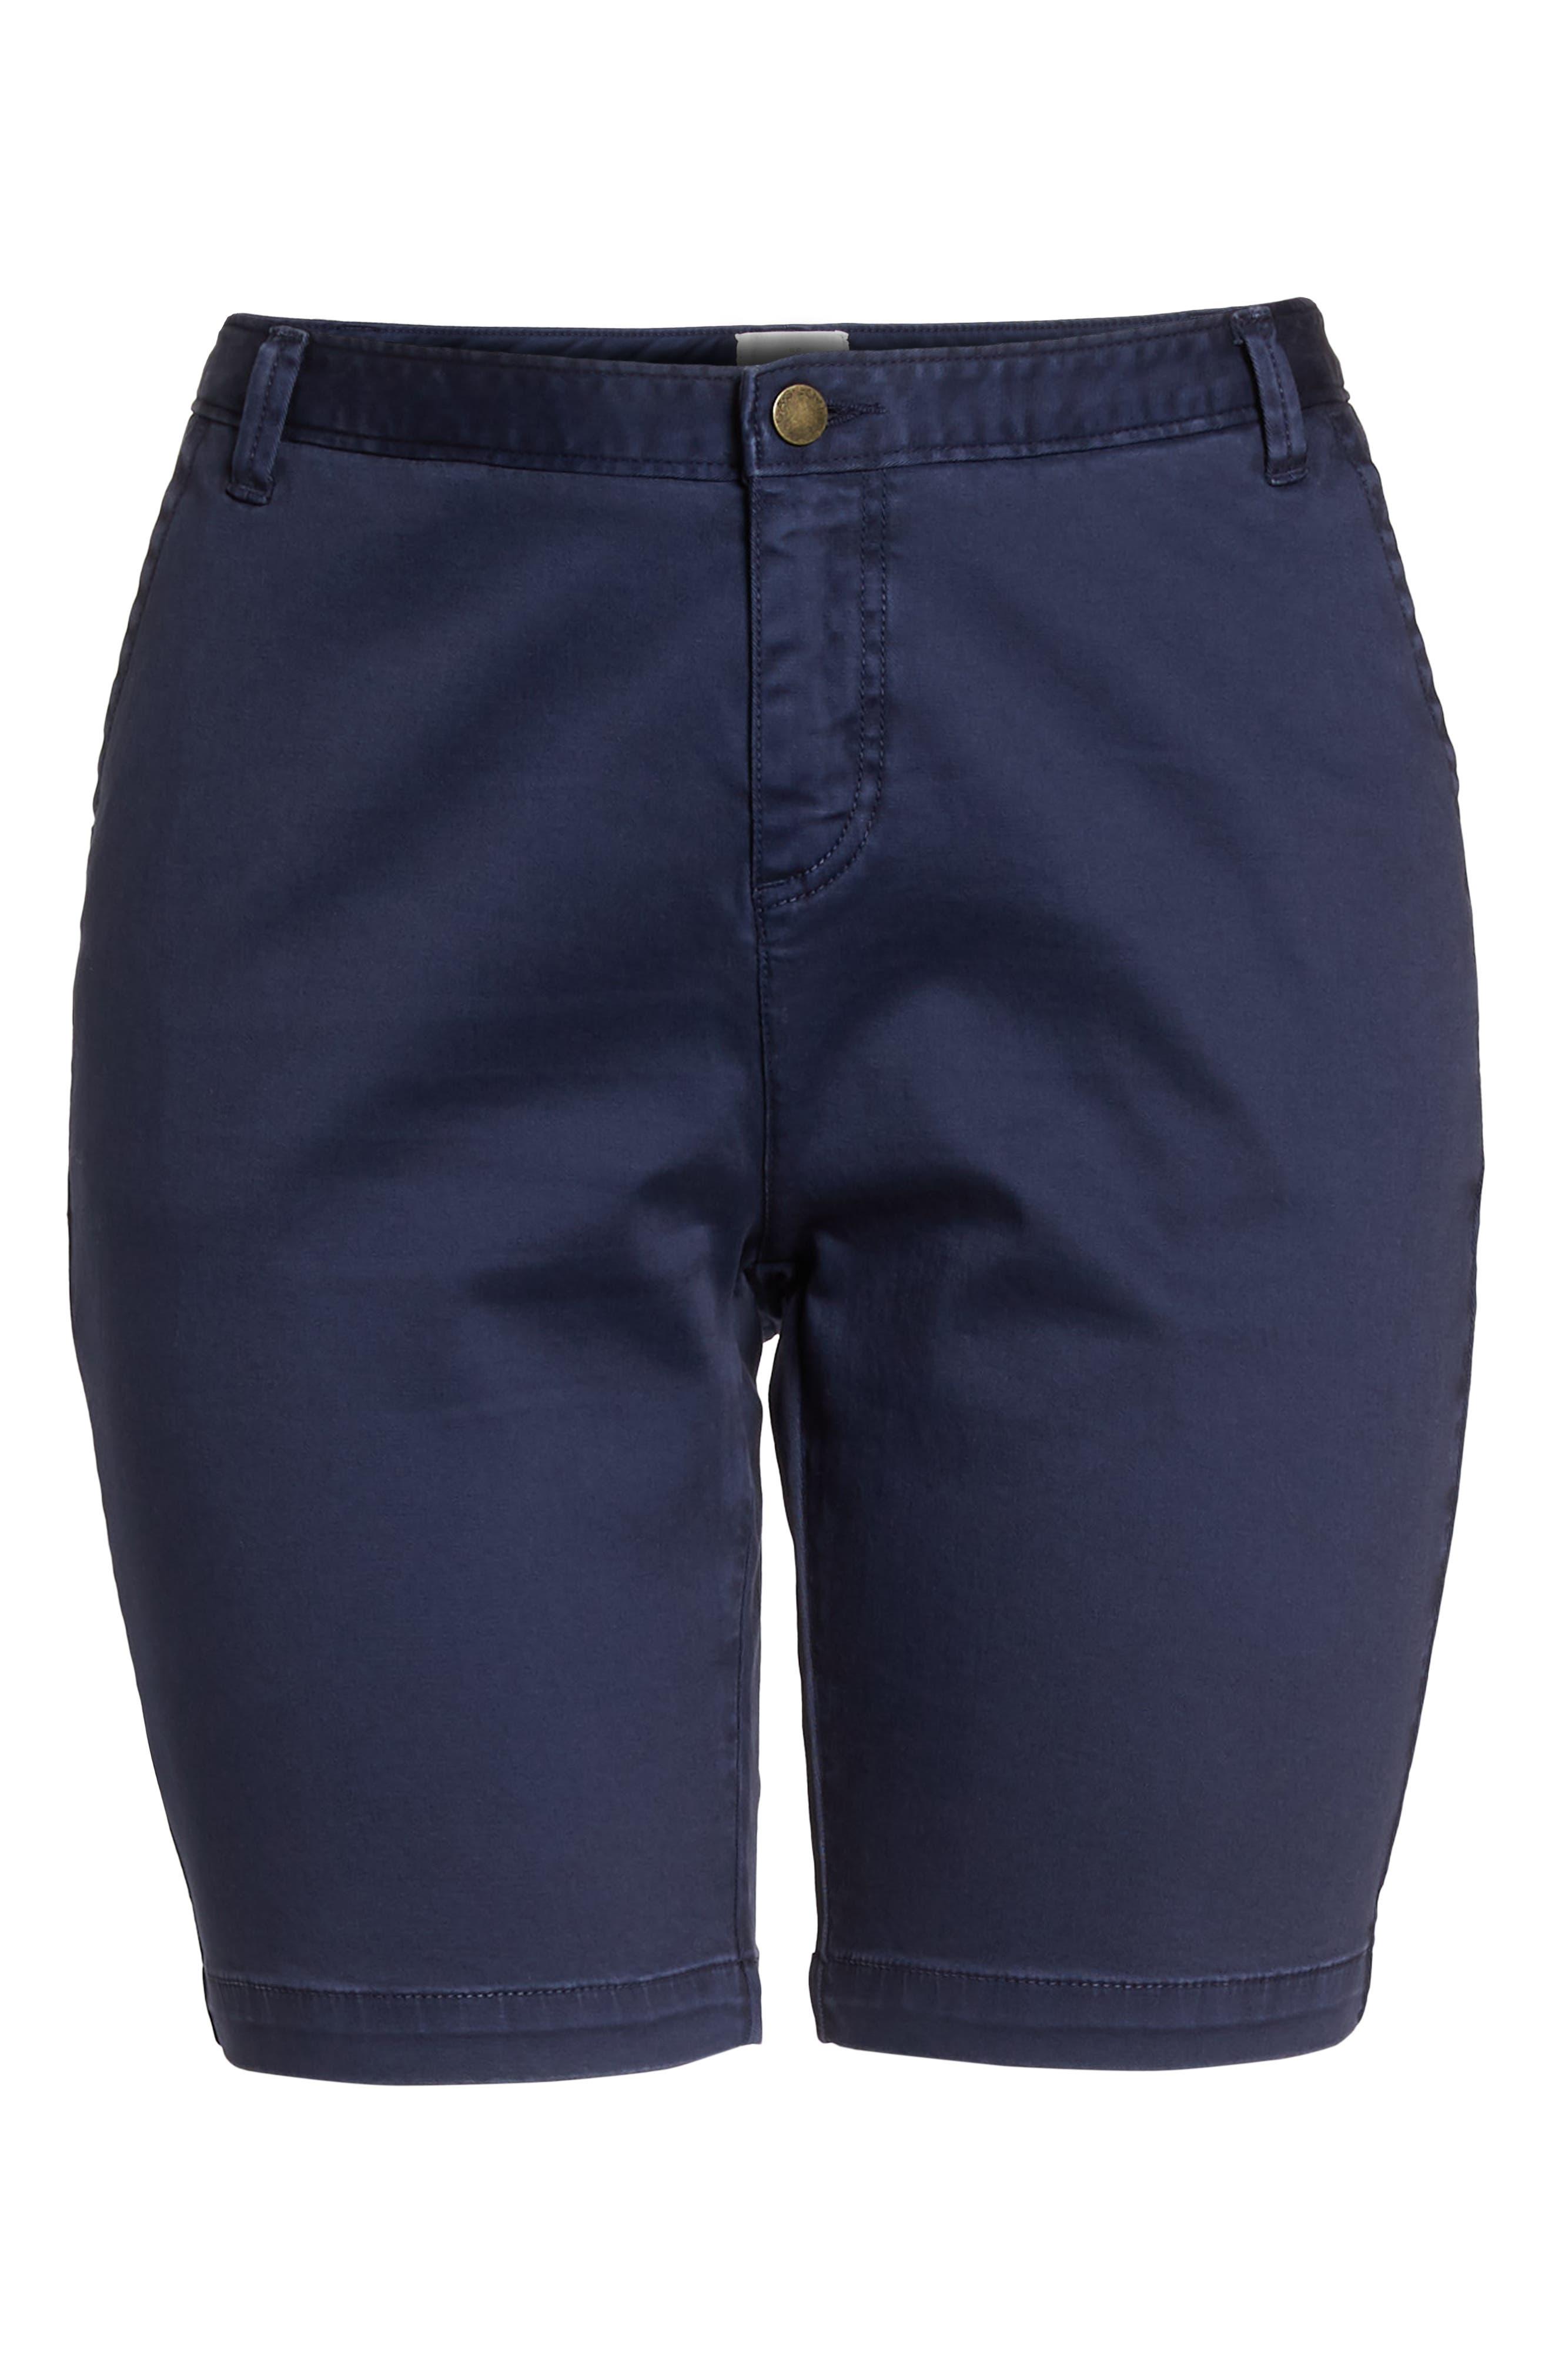 Twill Shorts,                             Alternate thumbnail 24, color,